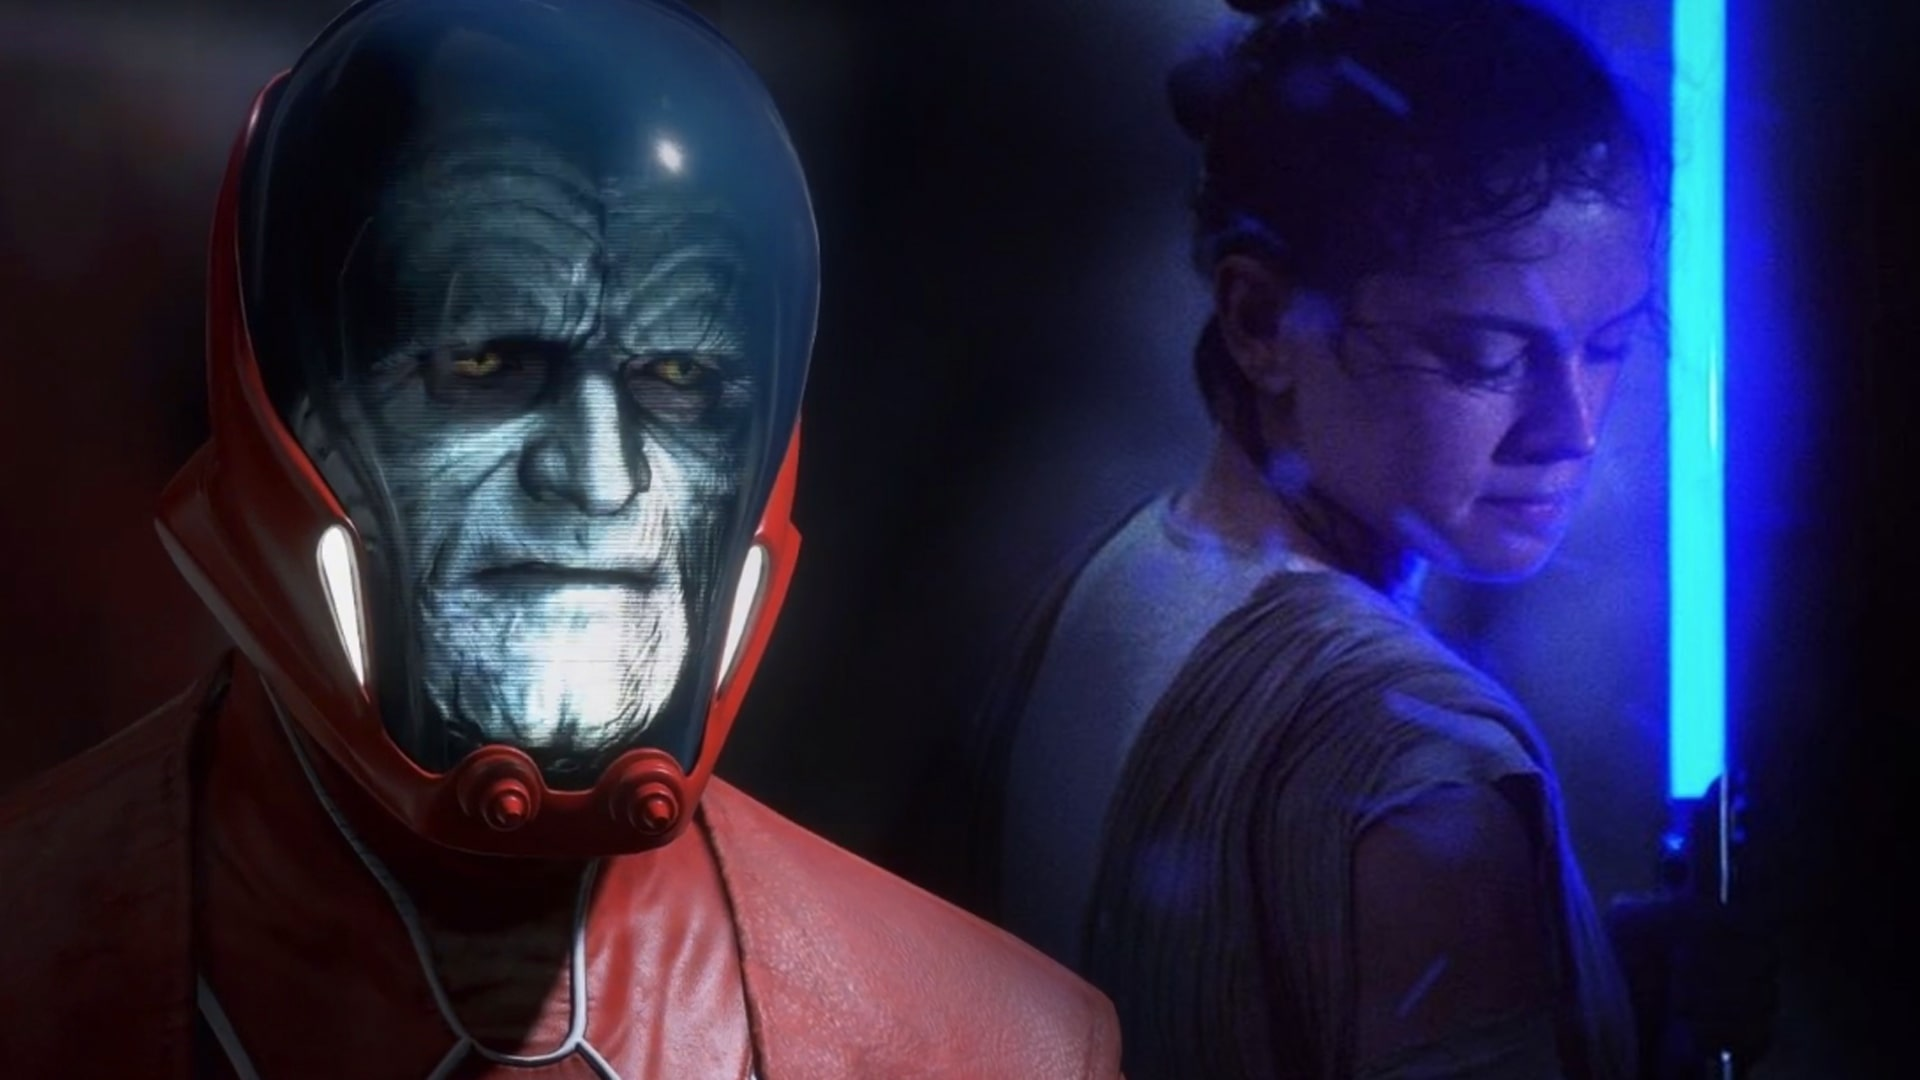 Star Wars The Rise Of Skywalker 20 7wallpapers Net